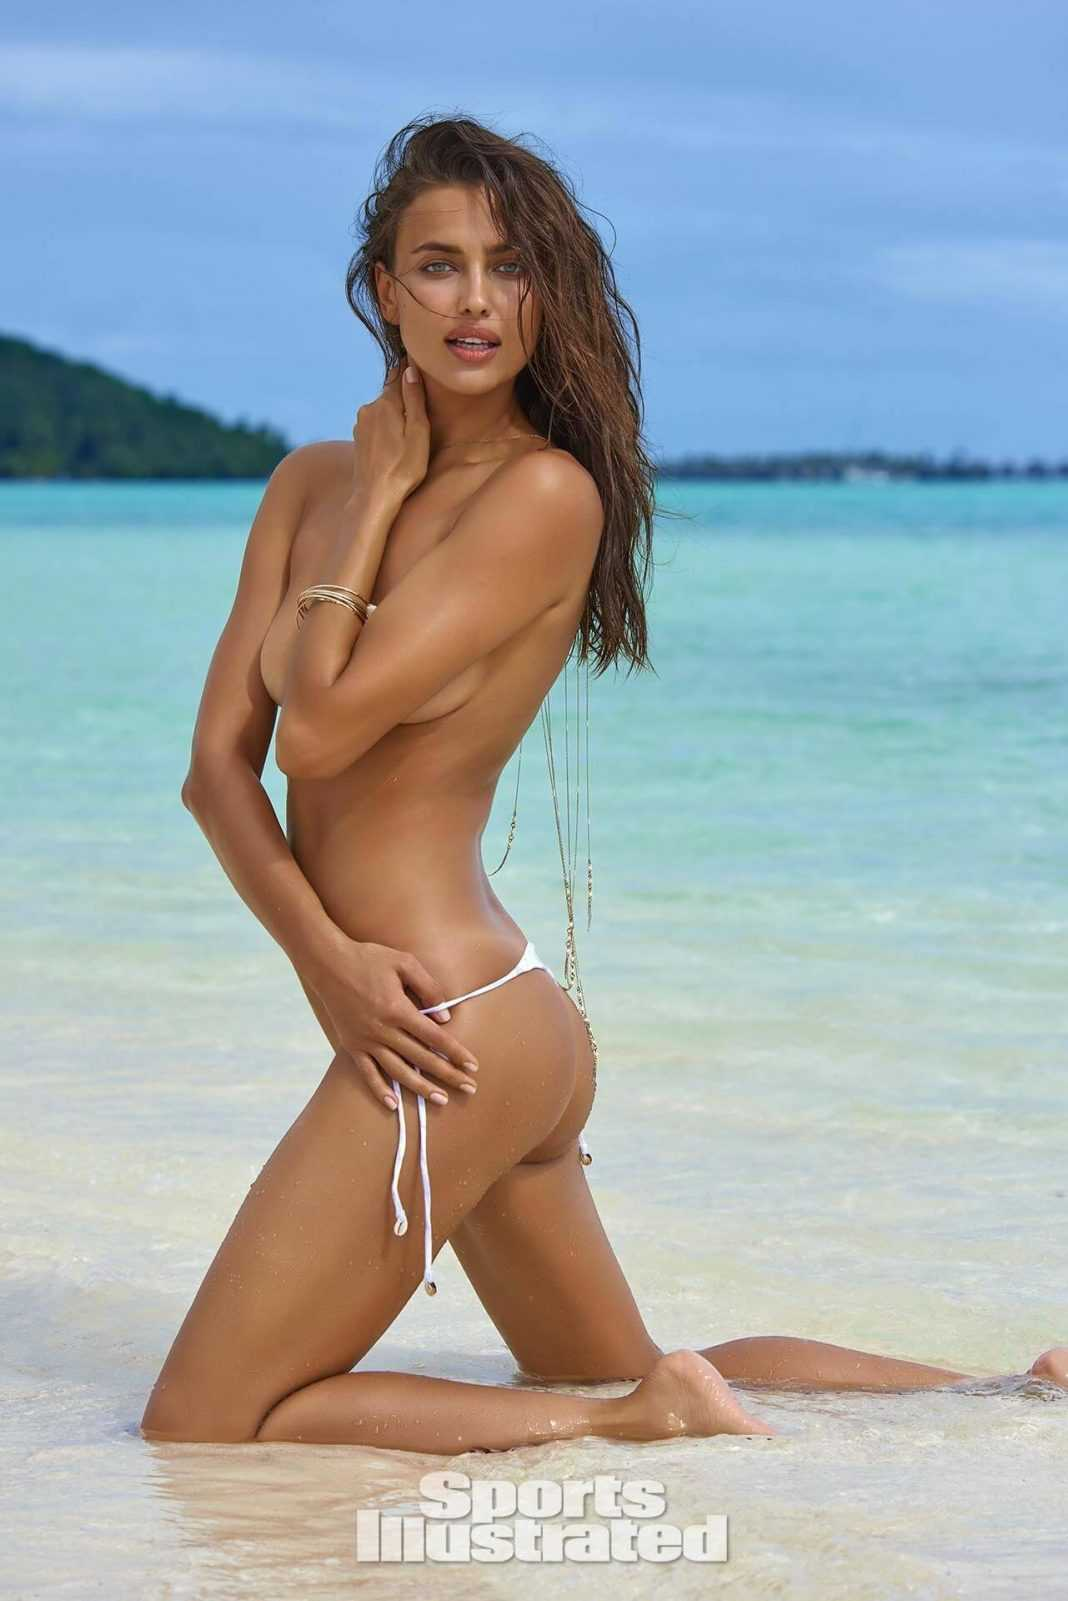 Irina Shayk busty look